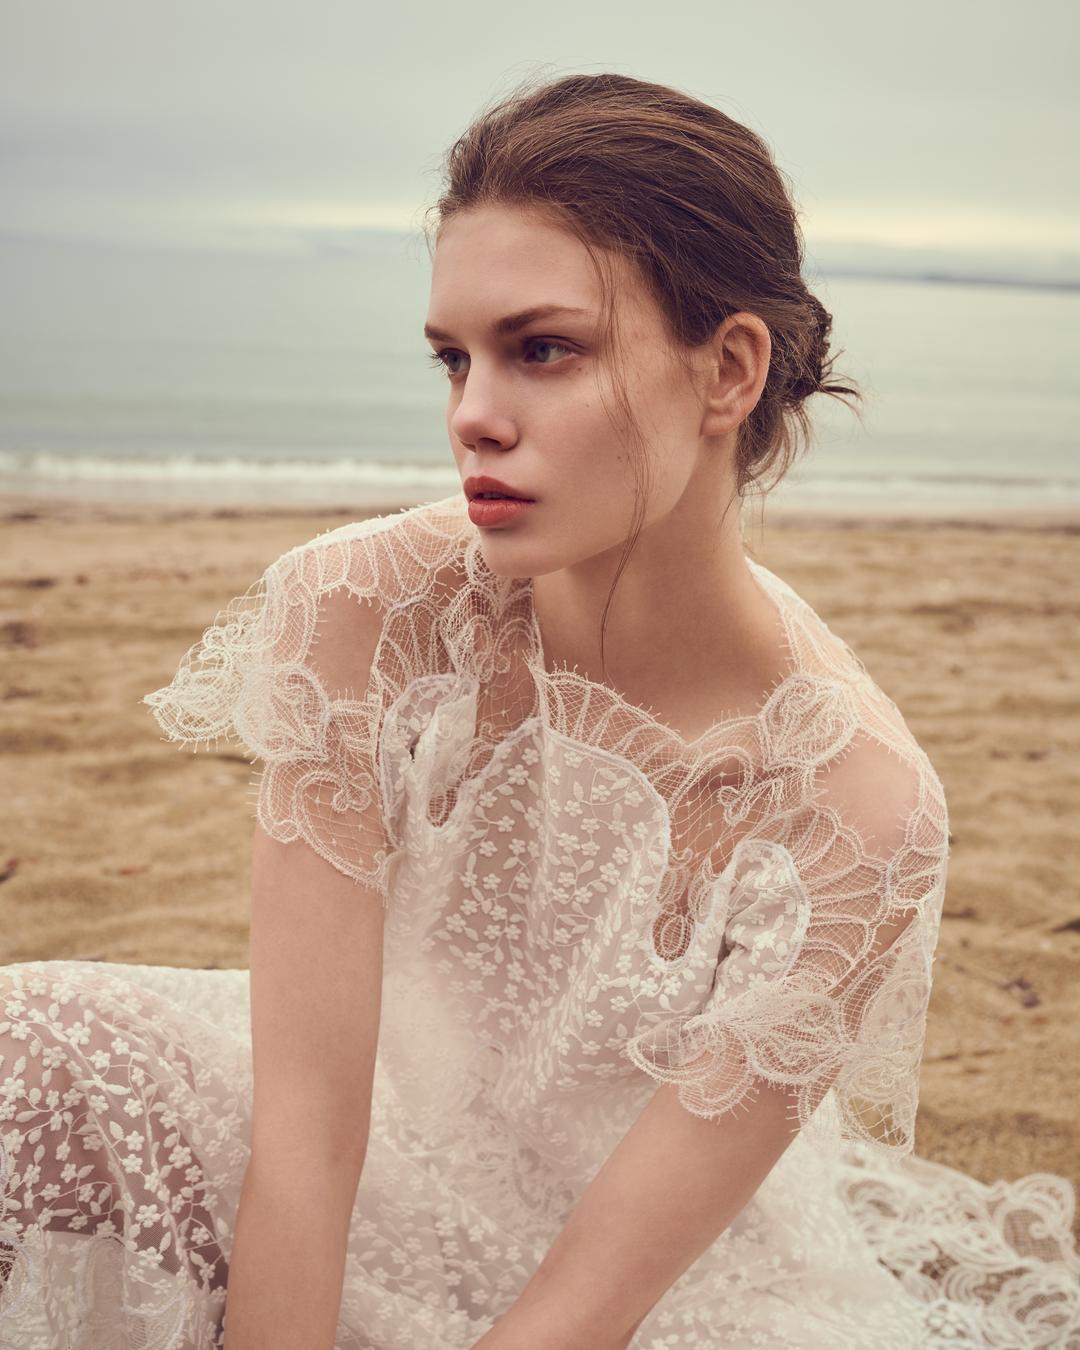 eudora top dress photo